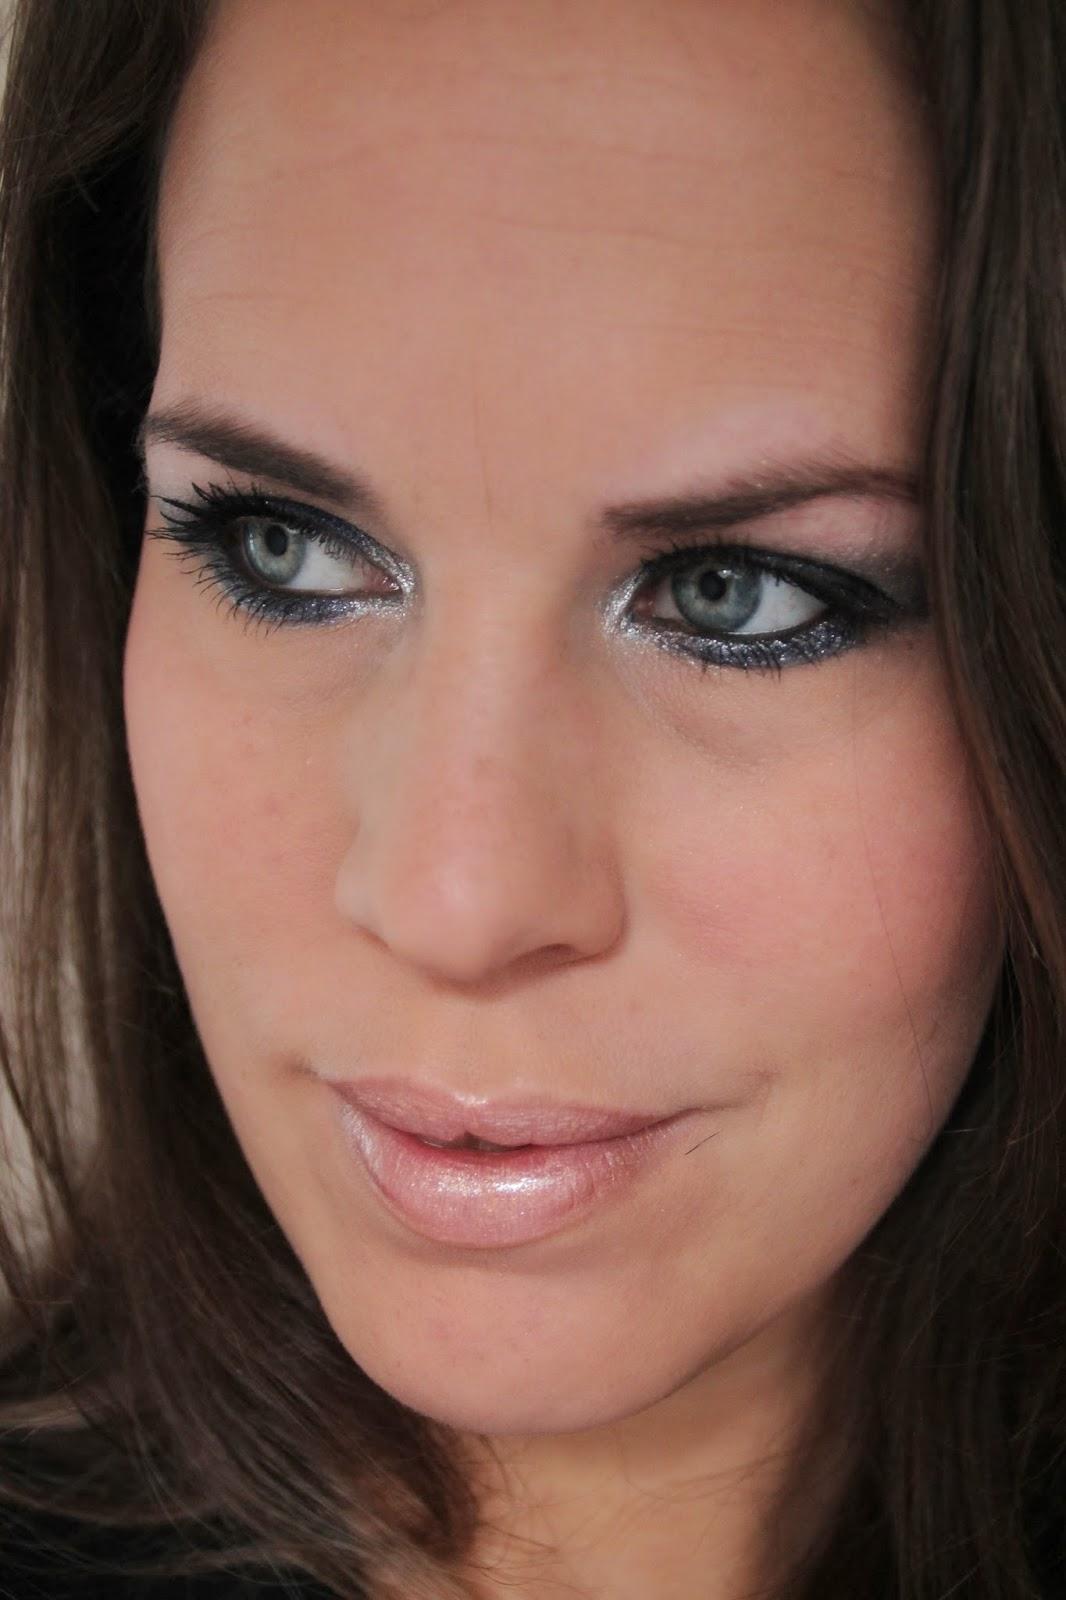 Crystaliciousss Mac Hailey Williams Lipstick Sounds Like: Crystaliciousss: Make-up Studio Metallic Chic Look